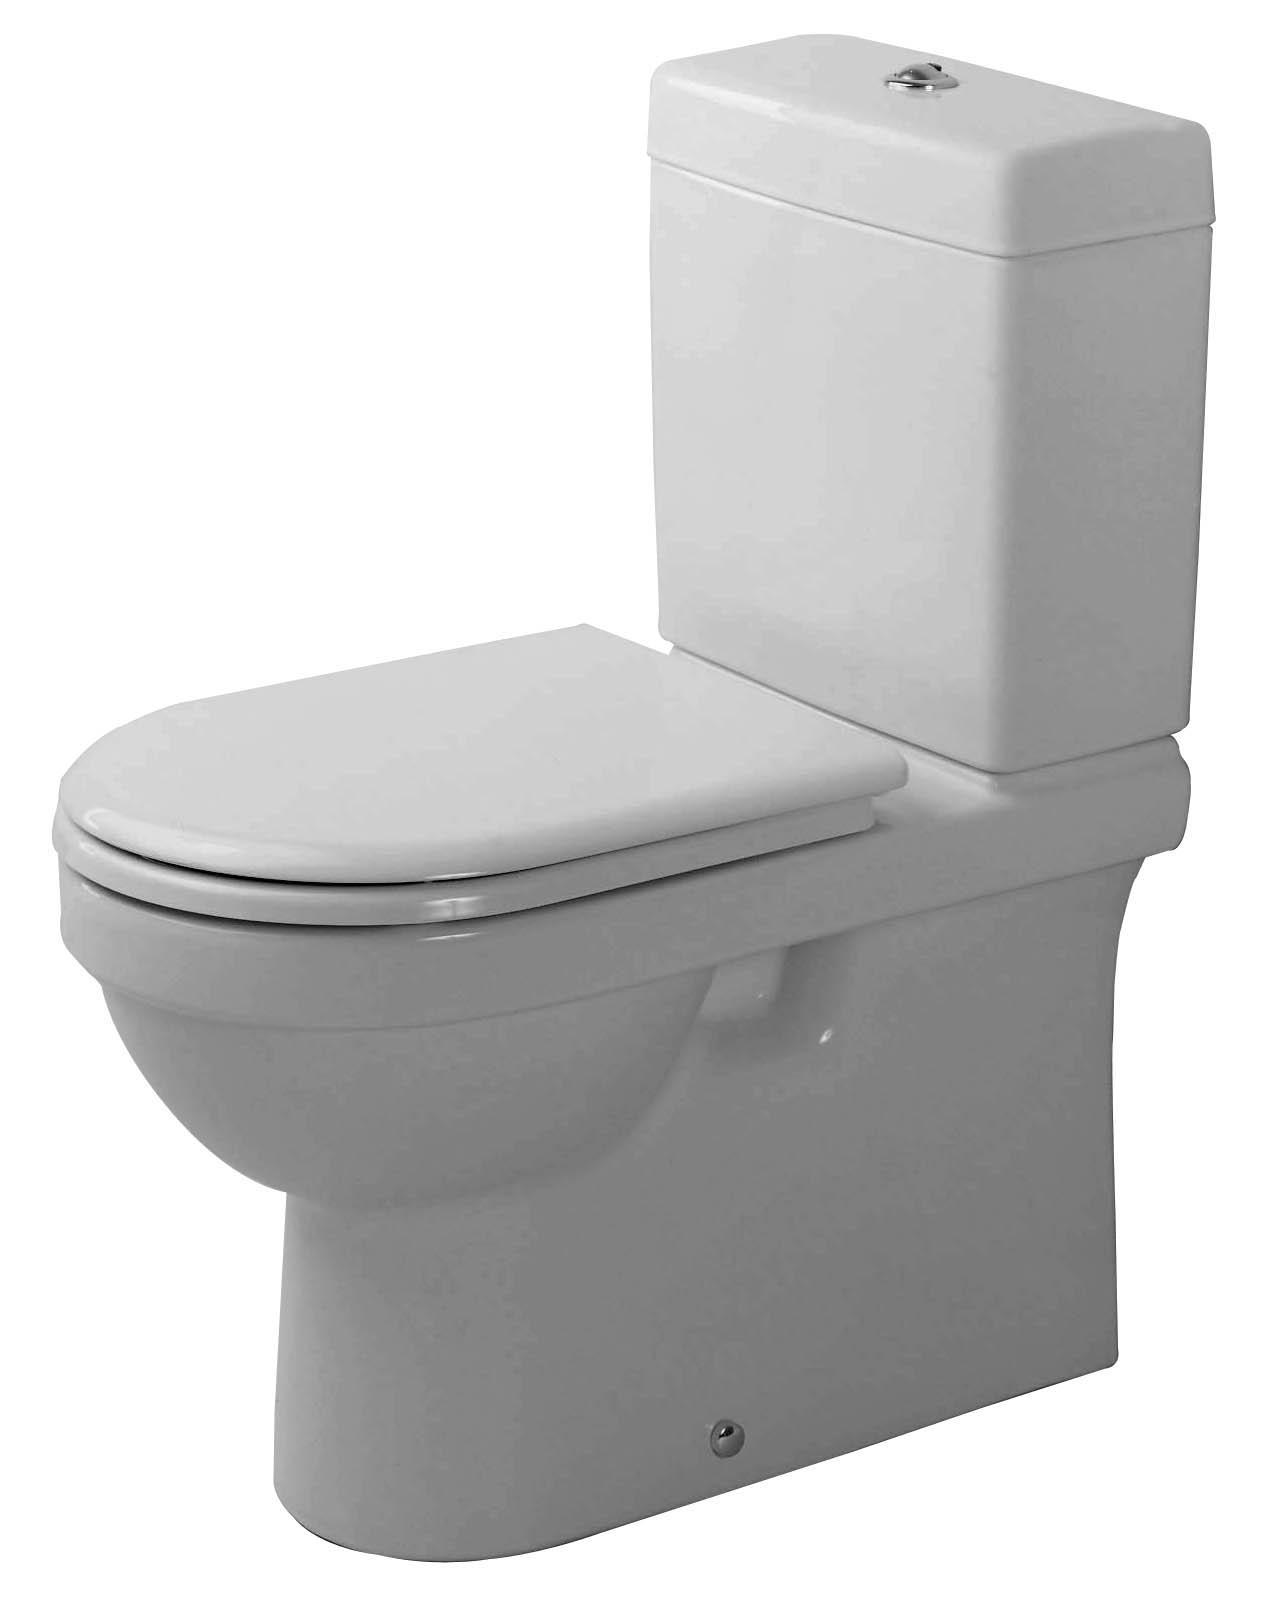 Tasa De Baño O Inodoro:5º) ¿ Cómo limpiar la taza del inodoro?